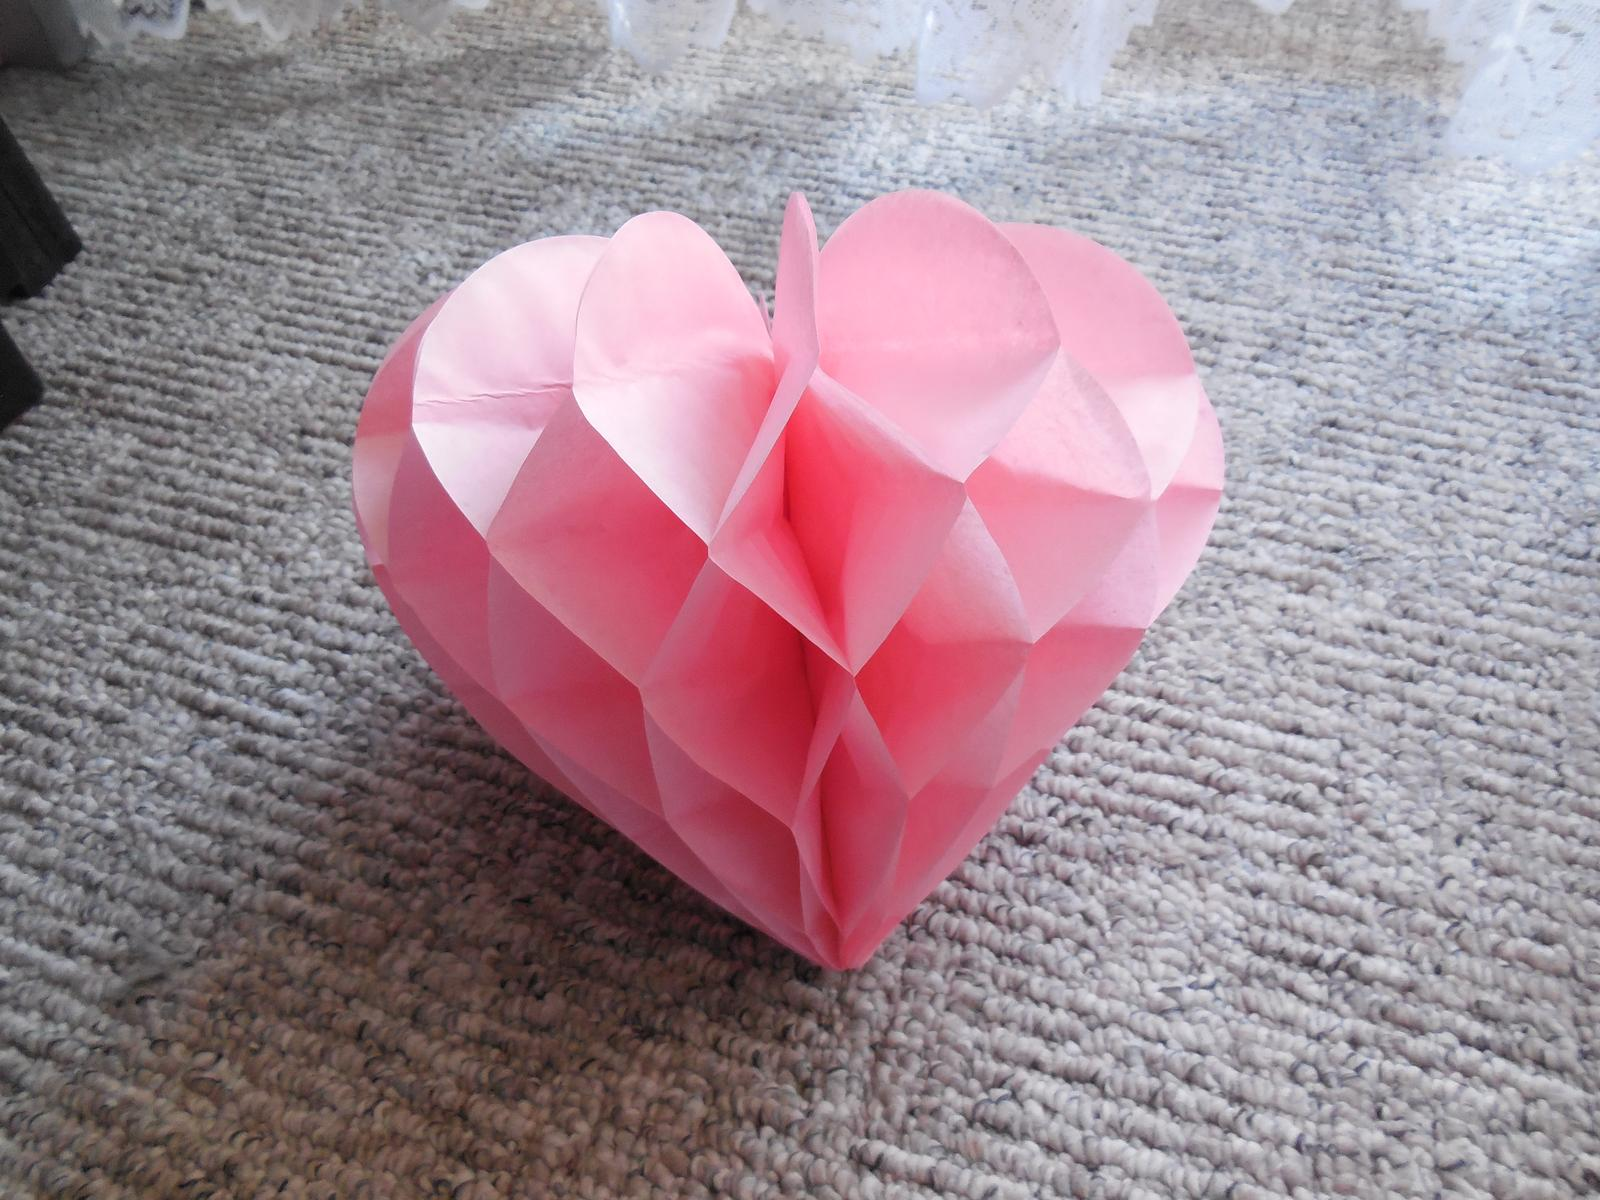 Honeycomb srdce bílé, růžové - Obrázek č. 1